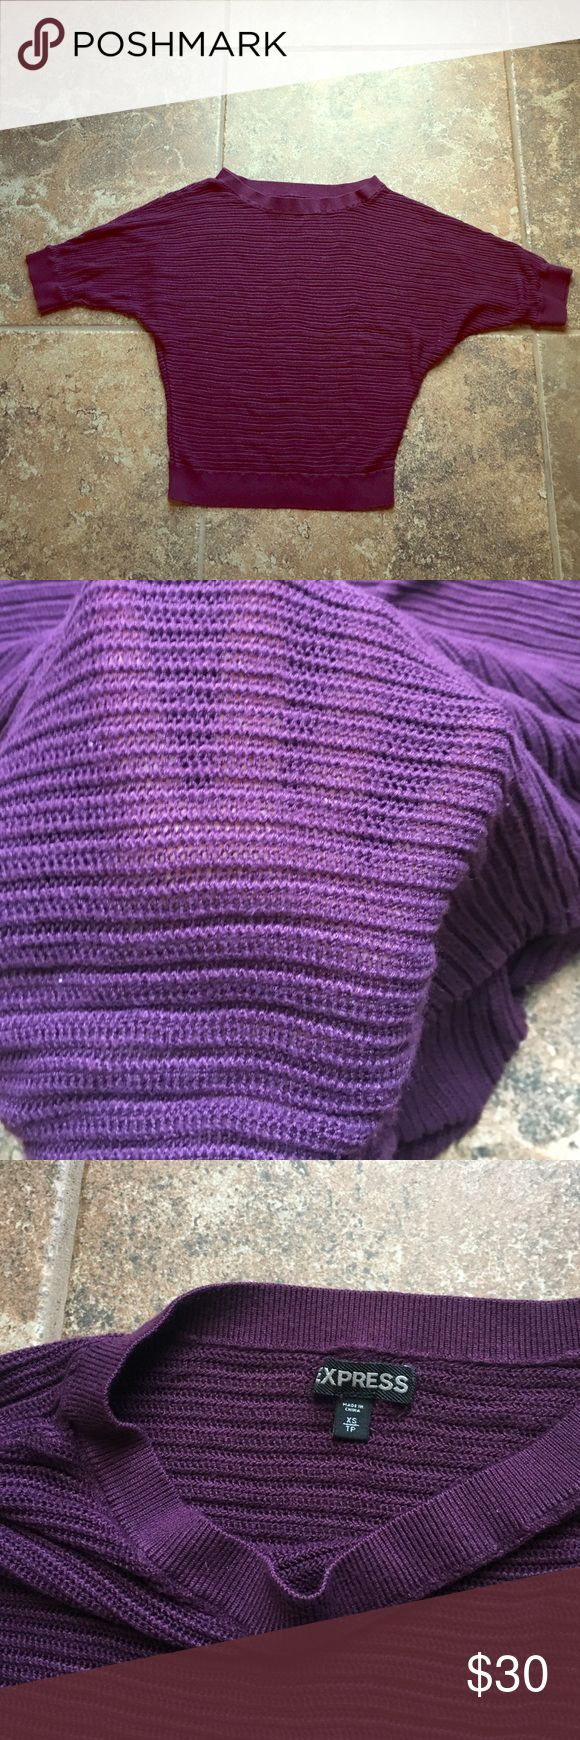 Purple tee- 3/4 length sleeved sweater Deep purple mesh 3/4 length sleeved sweater. Barely worn good condition. Express Sweaters Shrugs & Ponchos